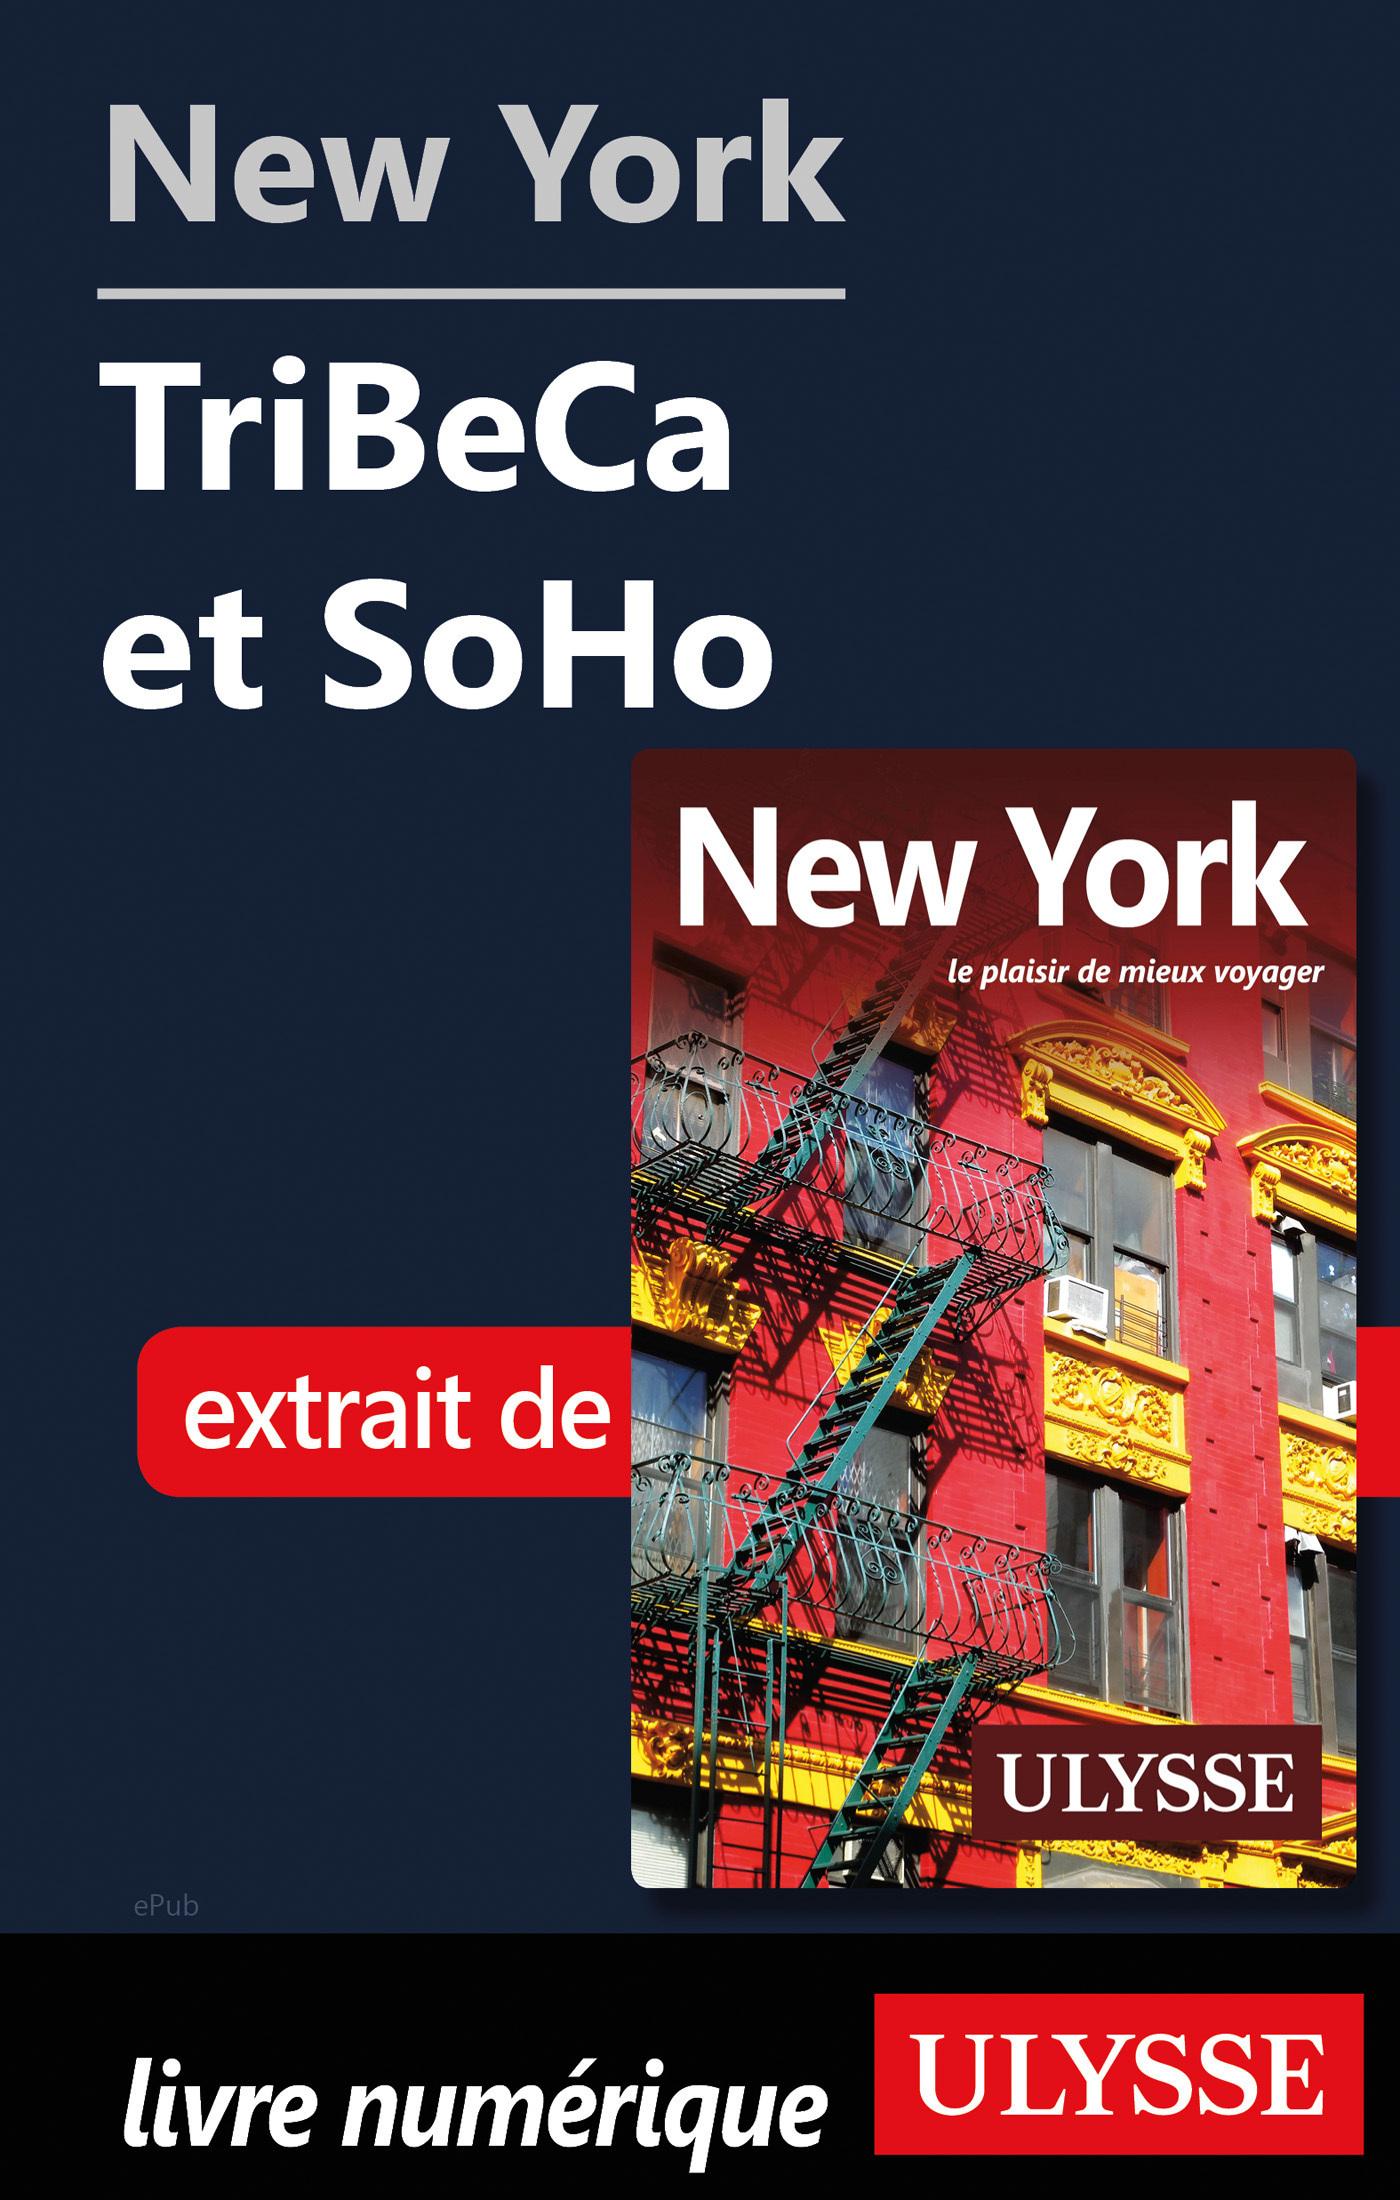 New York - Tribeca et Soho